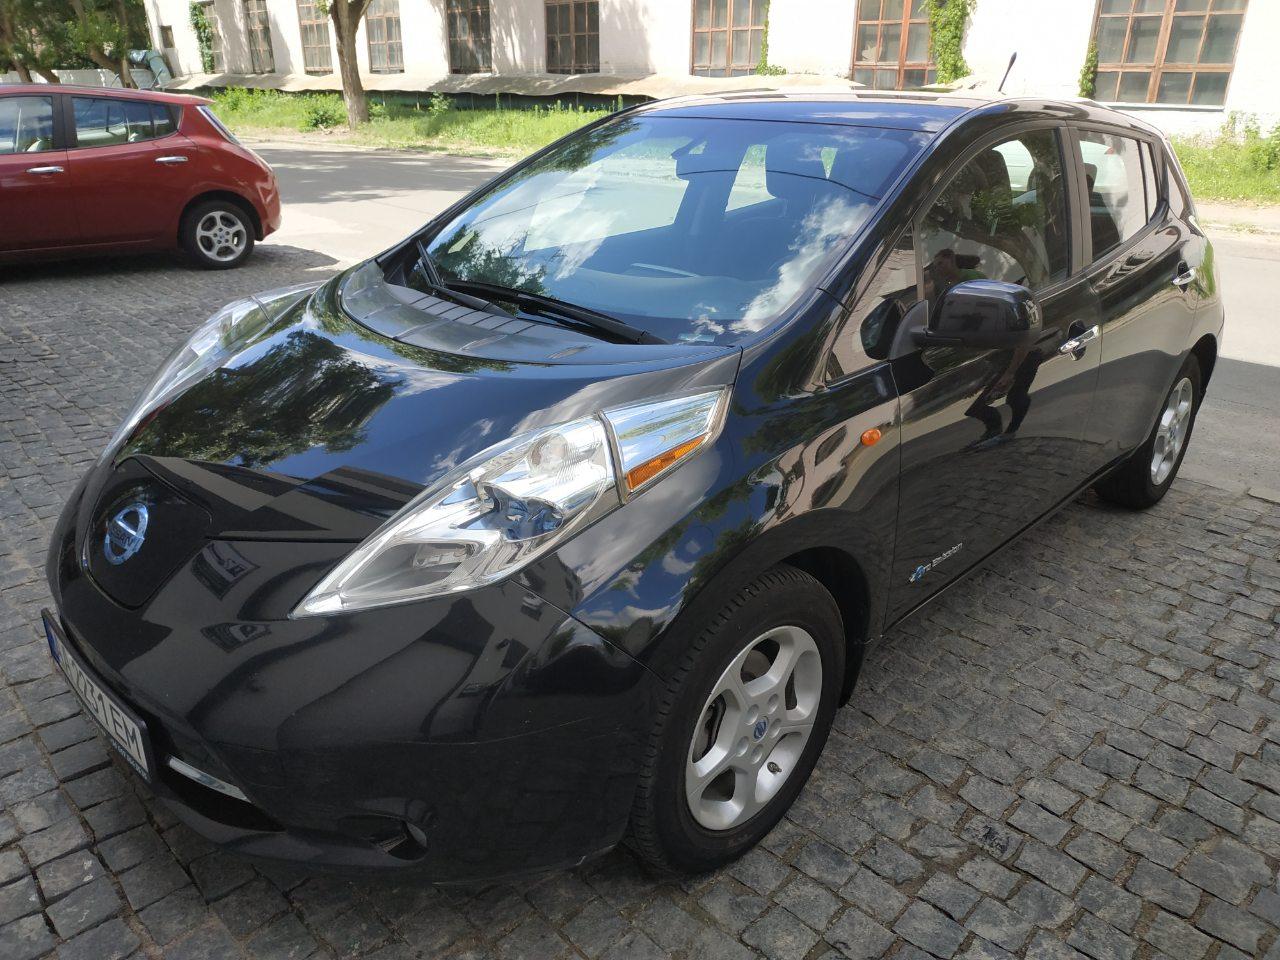 http://autocredit.com.ua/electro-cars/uploads/3/19-02-20/7TbOfB_xwDcQj9Co7.jpeg